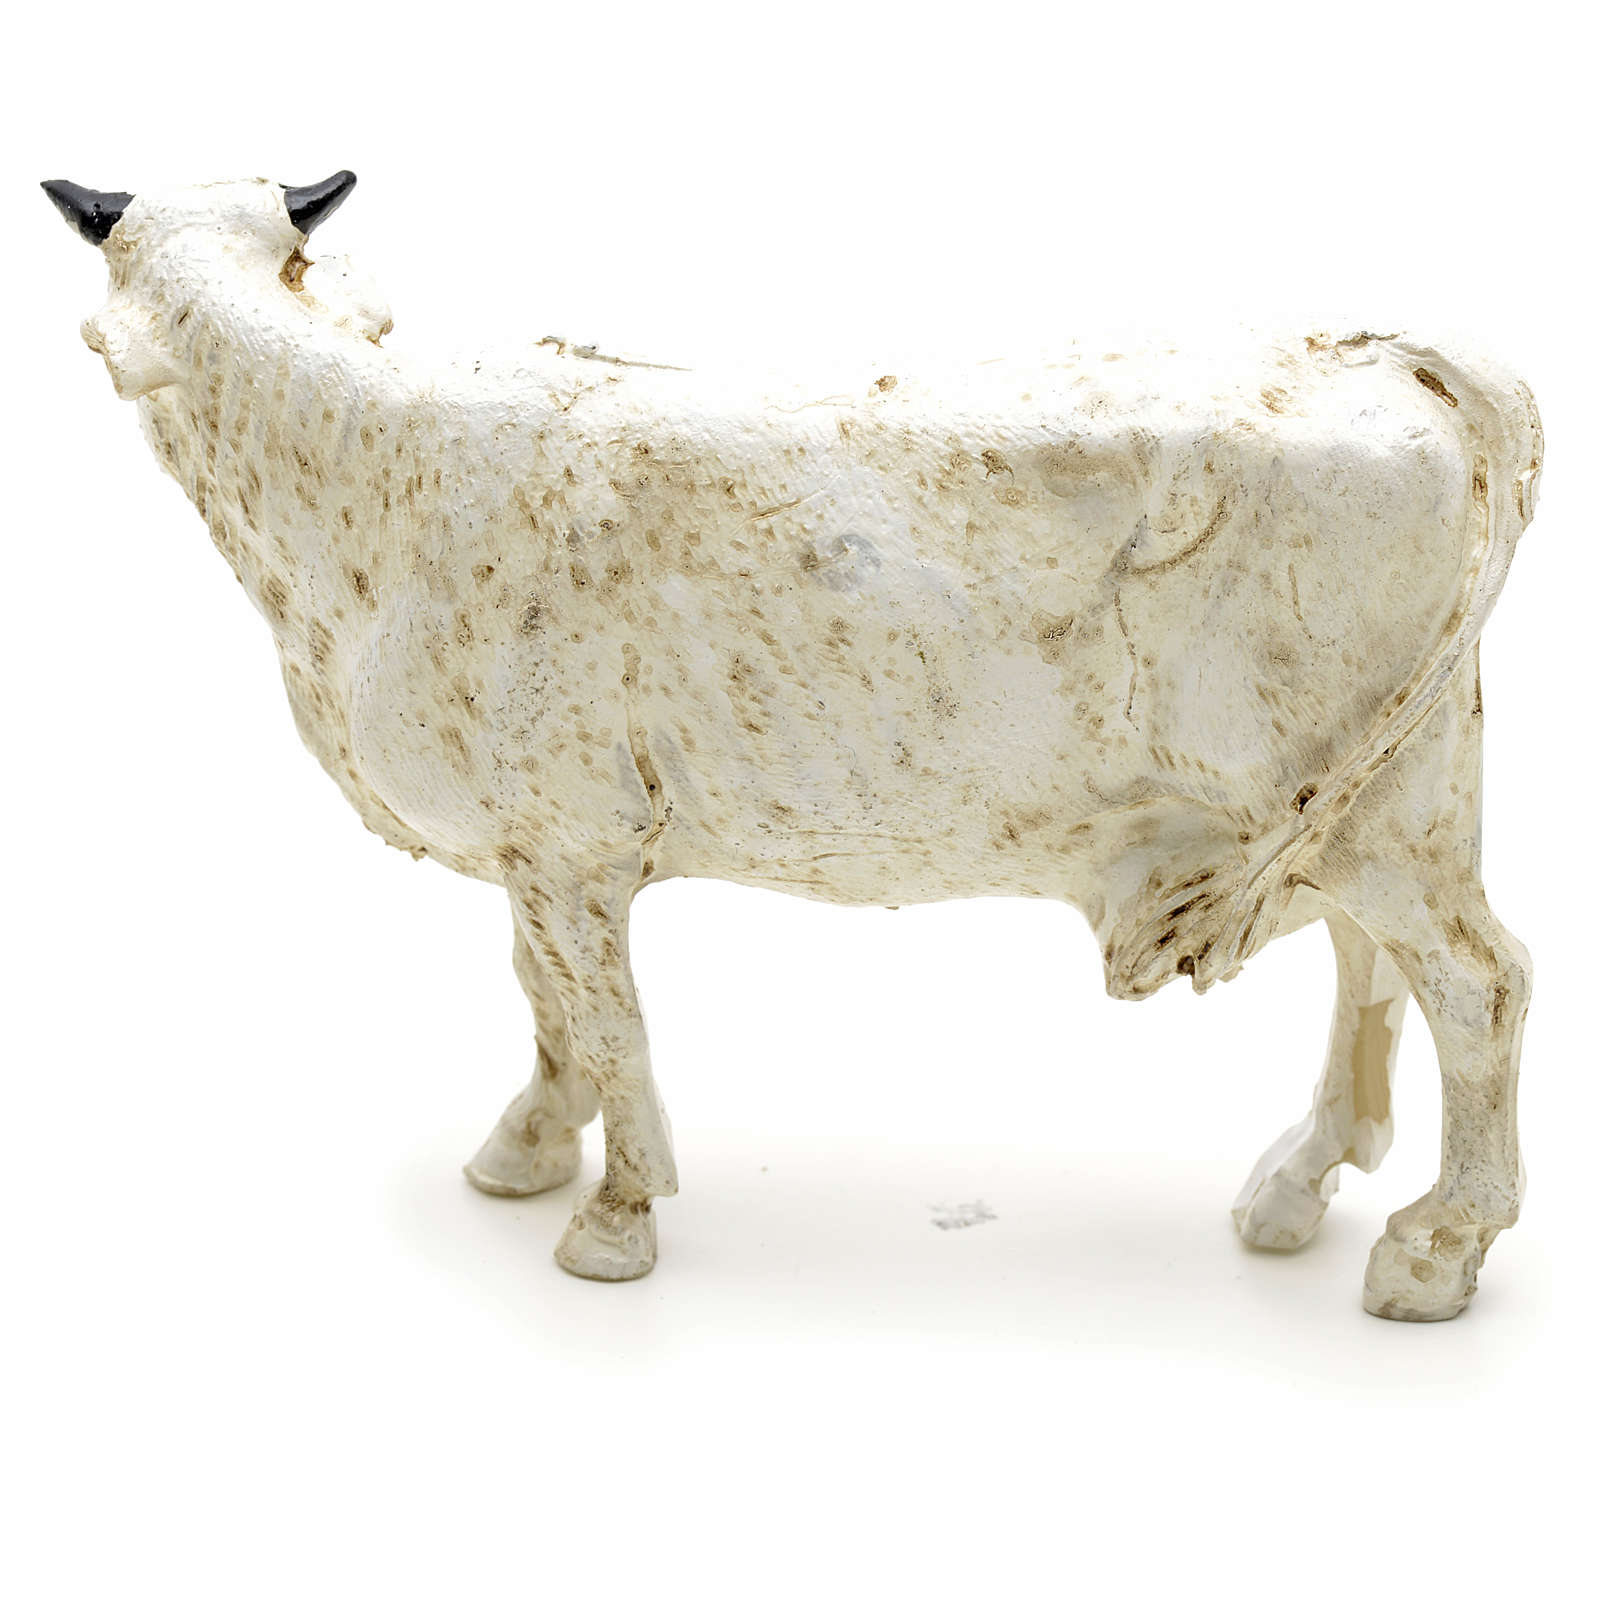 Mucca resina presepe 12 cm 3